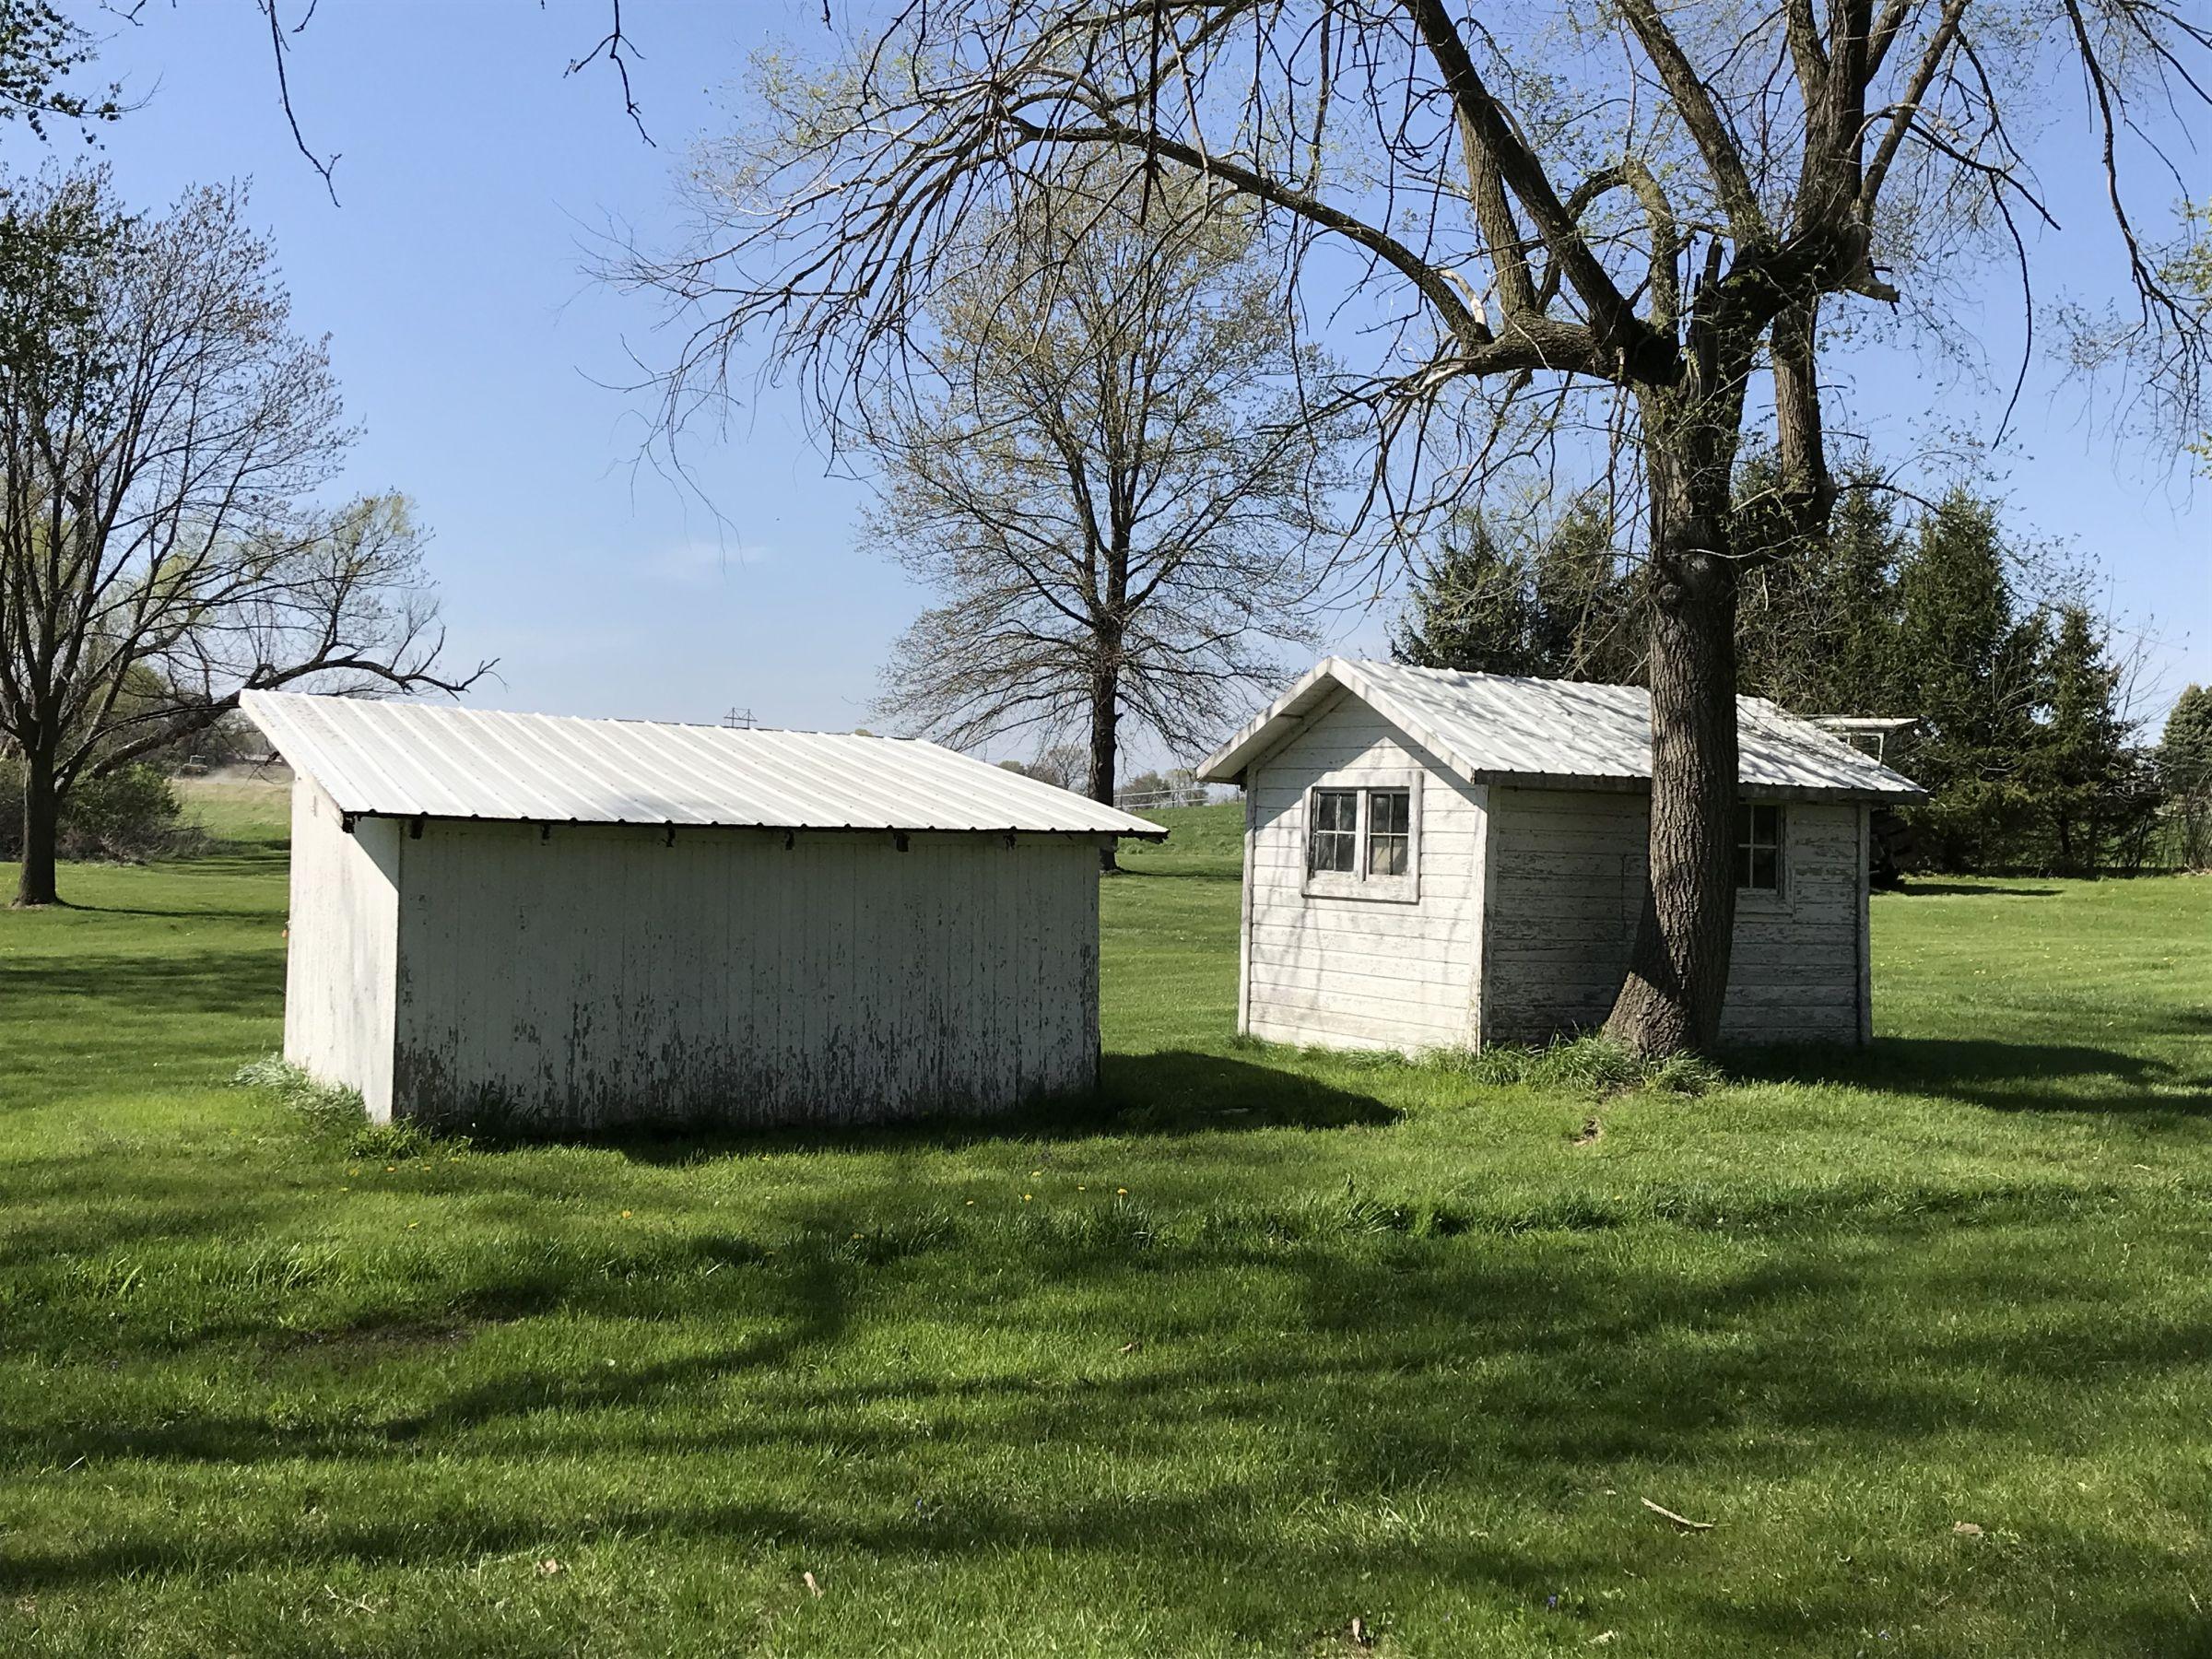 residential-polk-county-iowa-34-acres-listing-number-15502-5-2021-04-29-144132.jpg